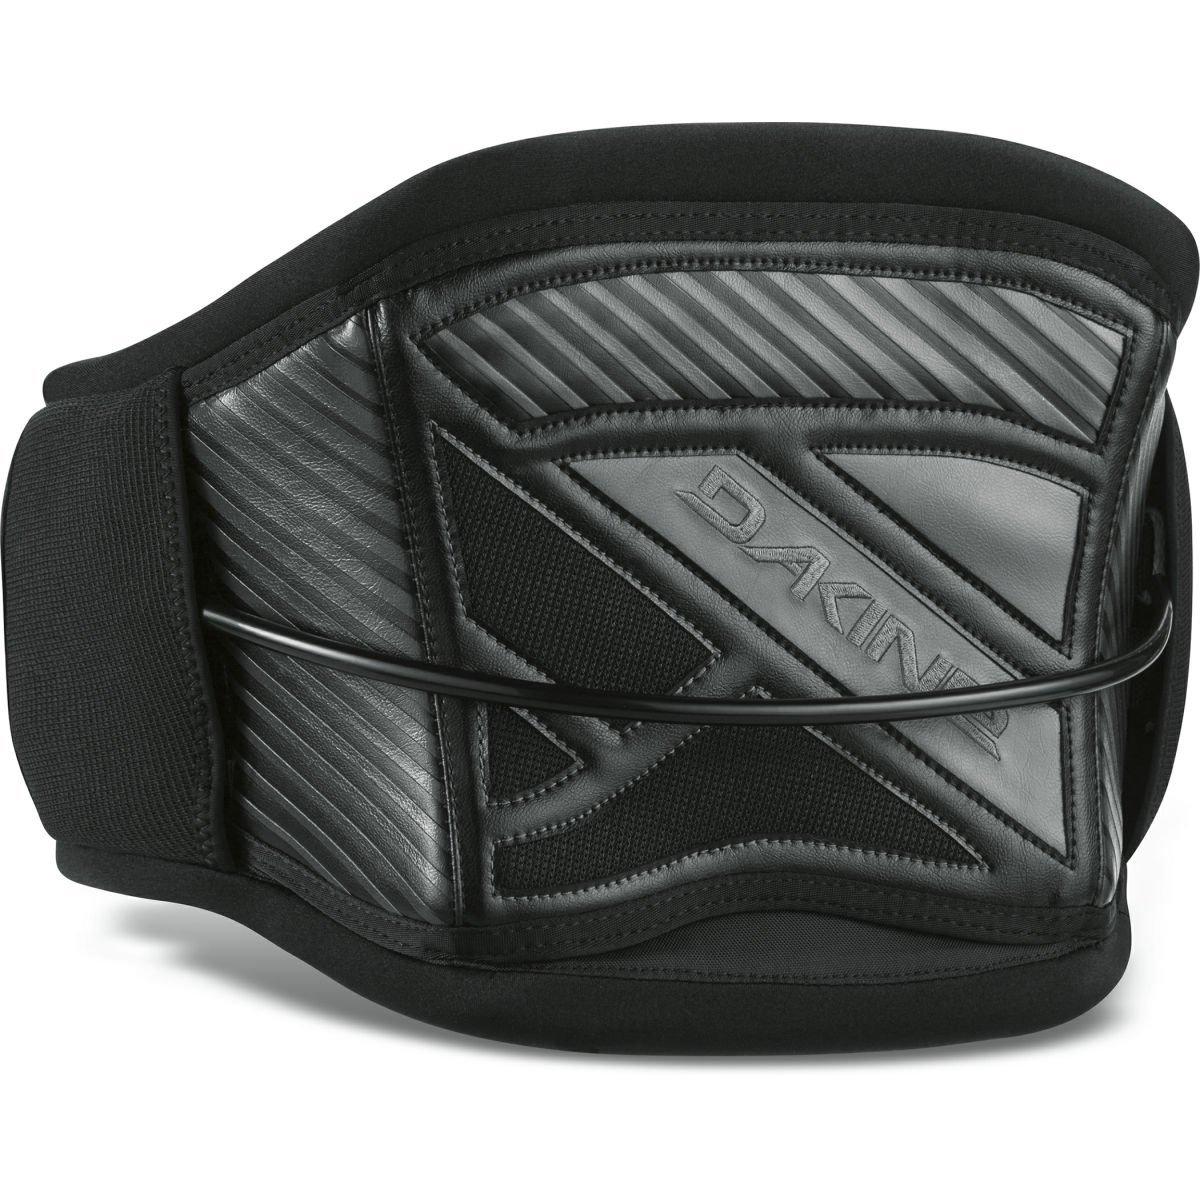 Dakine Men's Hybrid Renegade Kite Harness, Black, XS